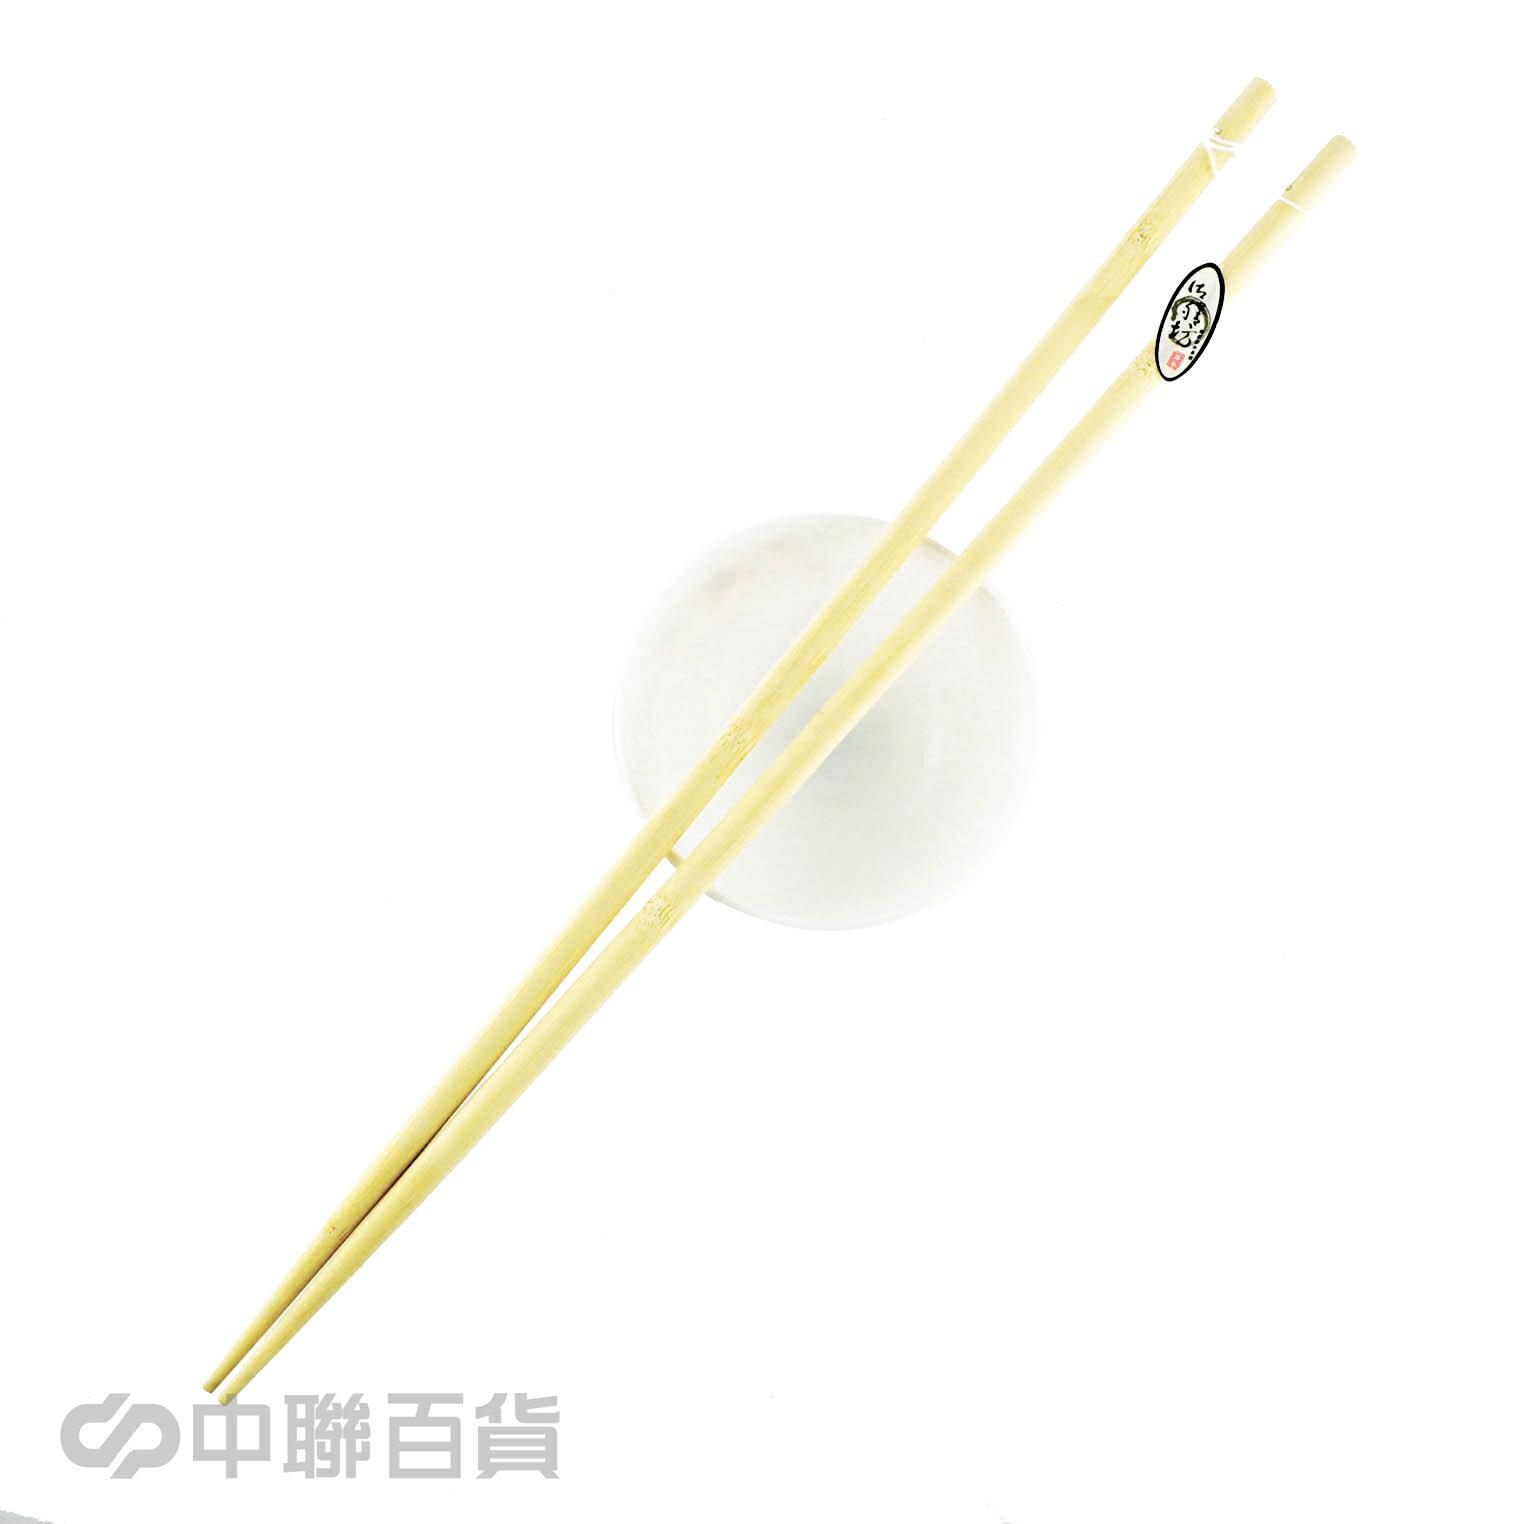 竹長筷(45cm)1雙 C83-3813